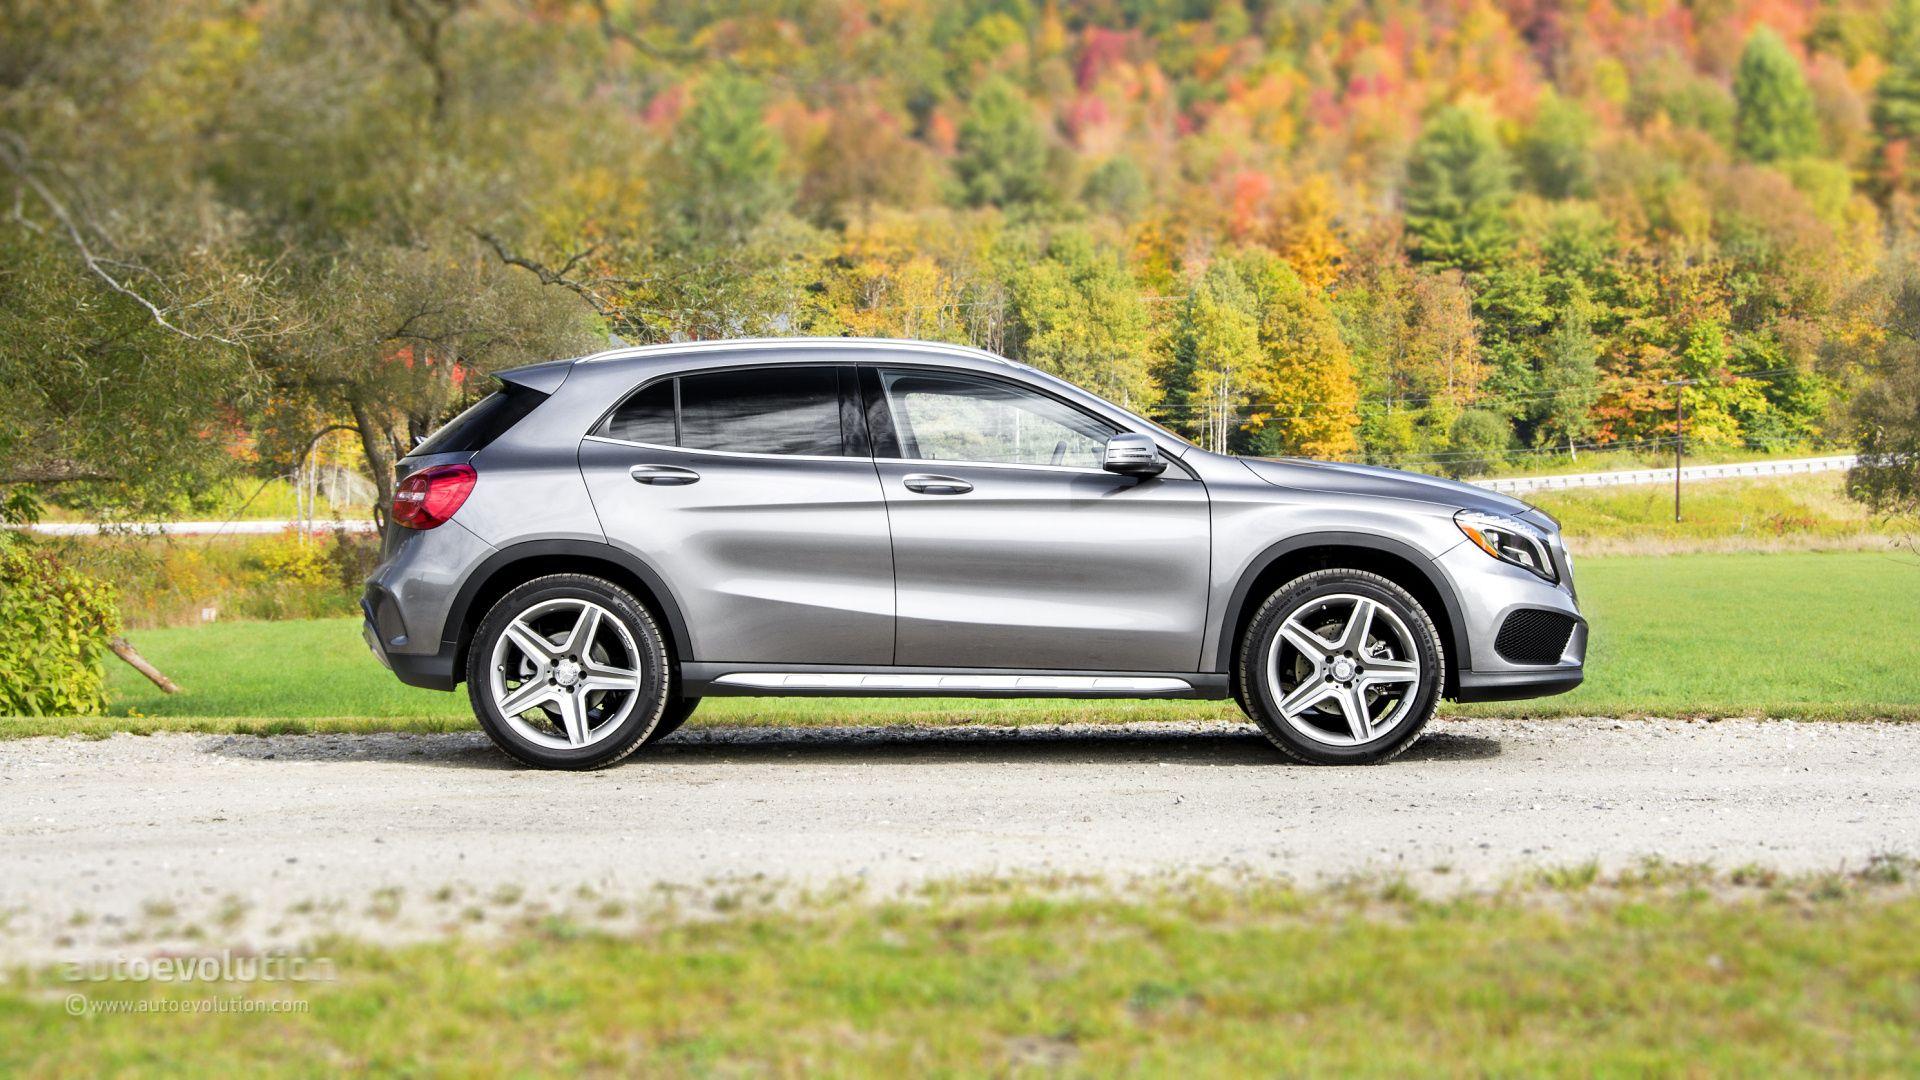 2015 Mercedes Benz Gla250 4matic Gla45 Amg Review Mercedes Gla Mercedes Benz Mercedes